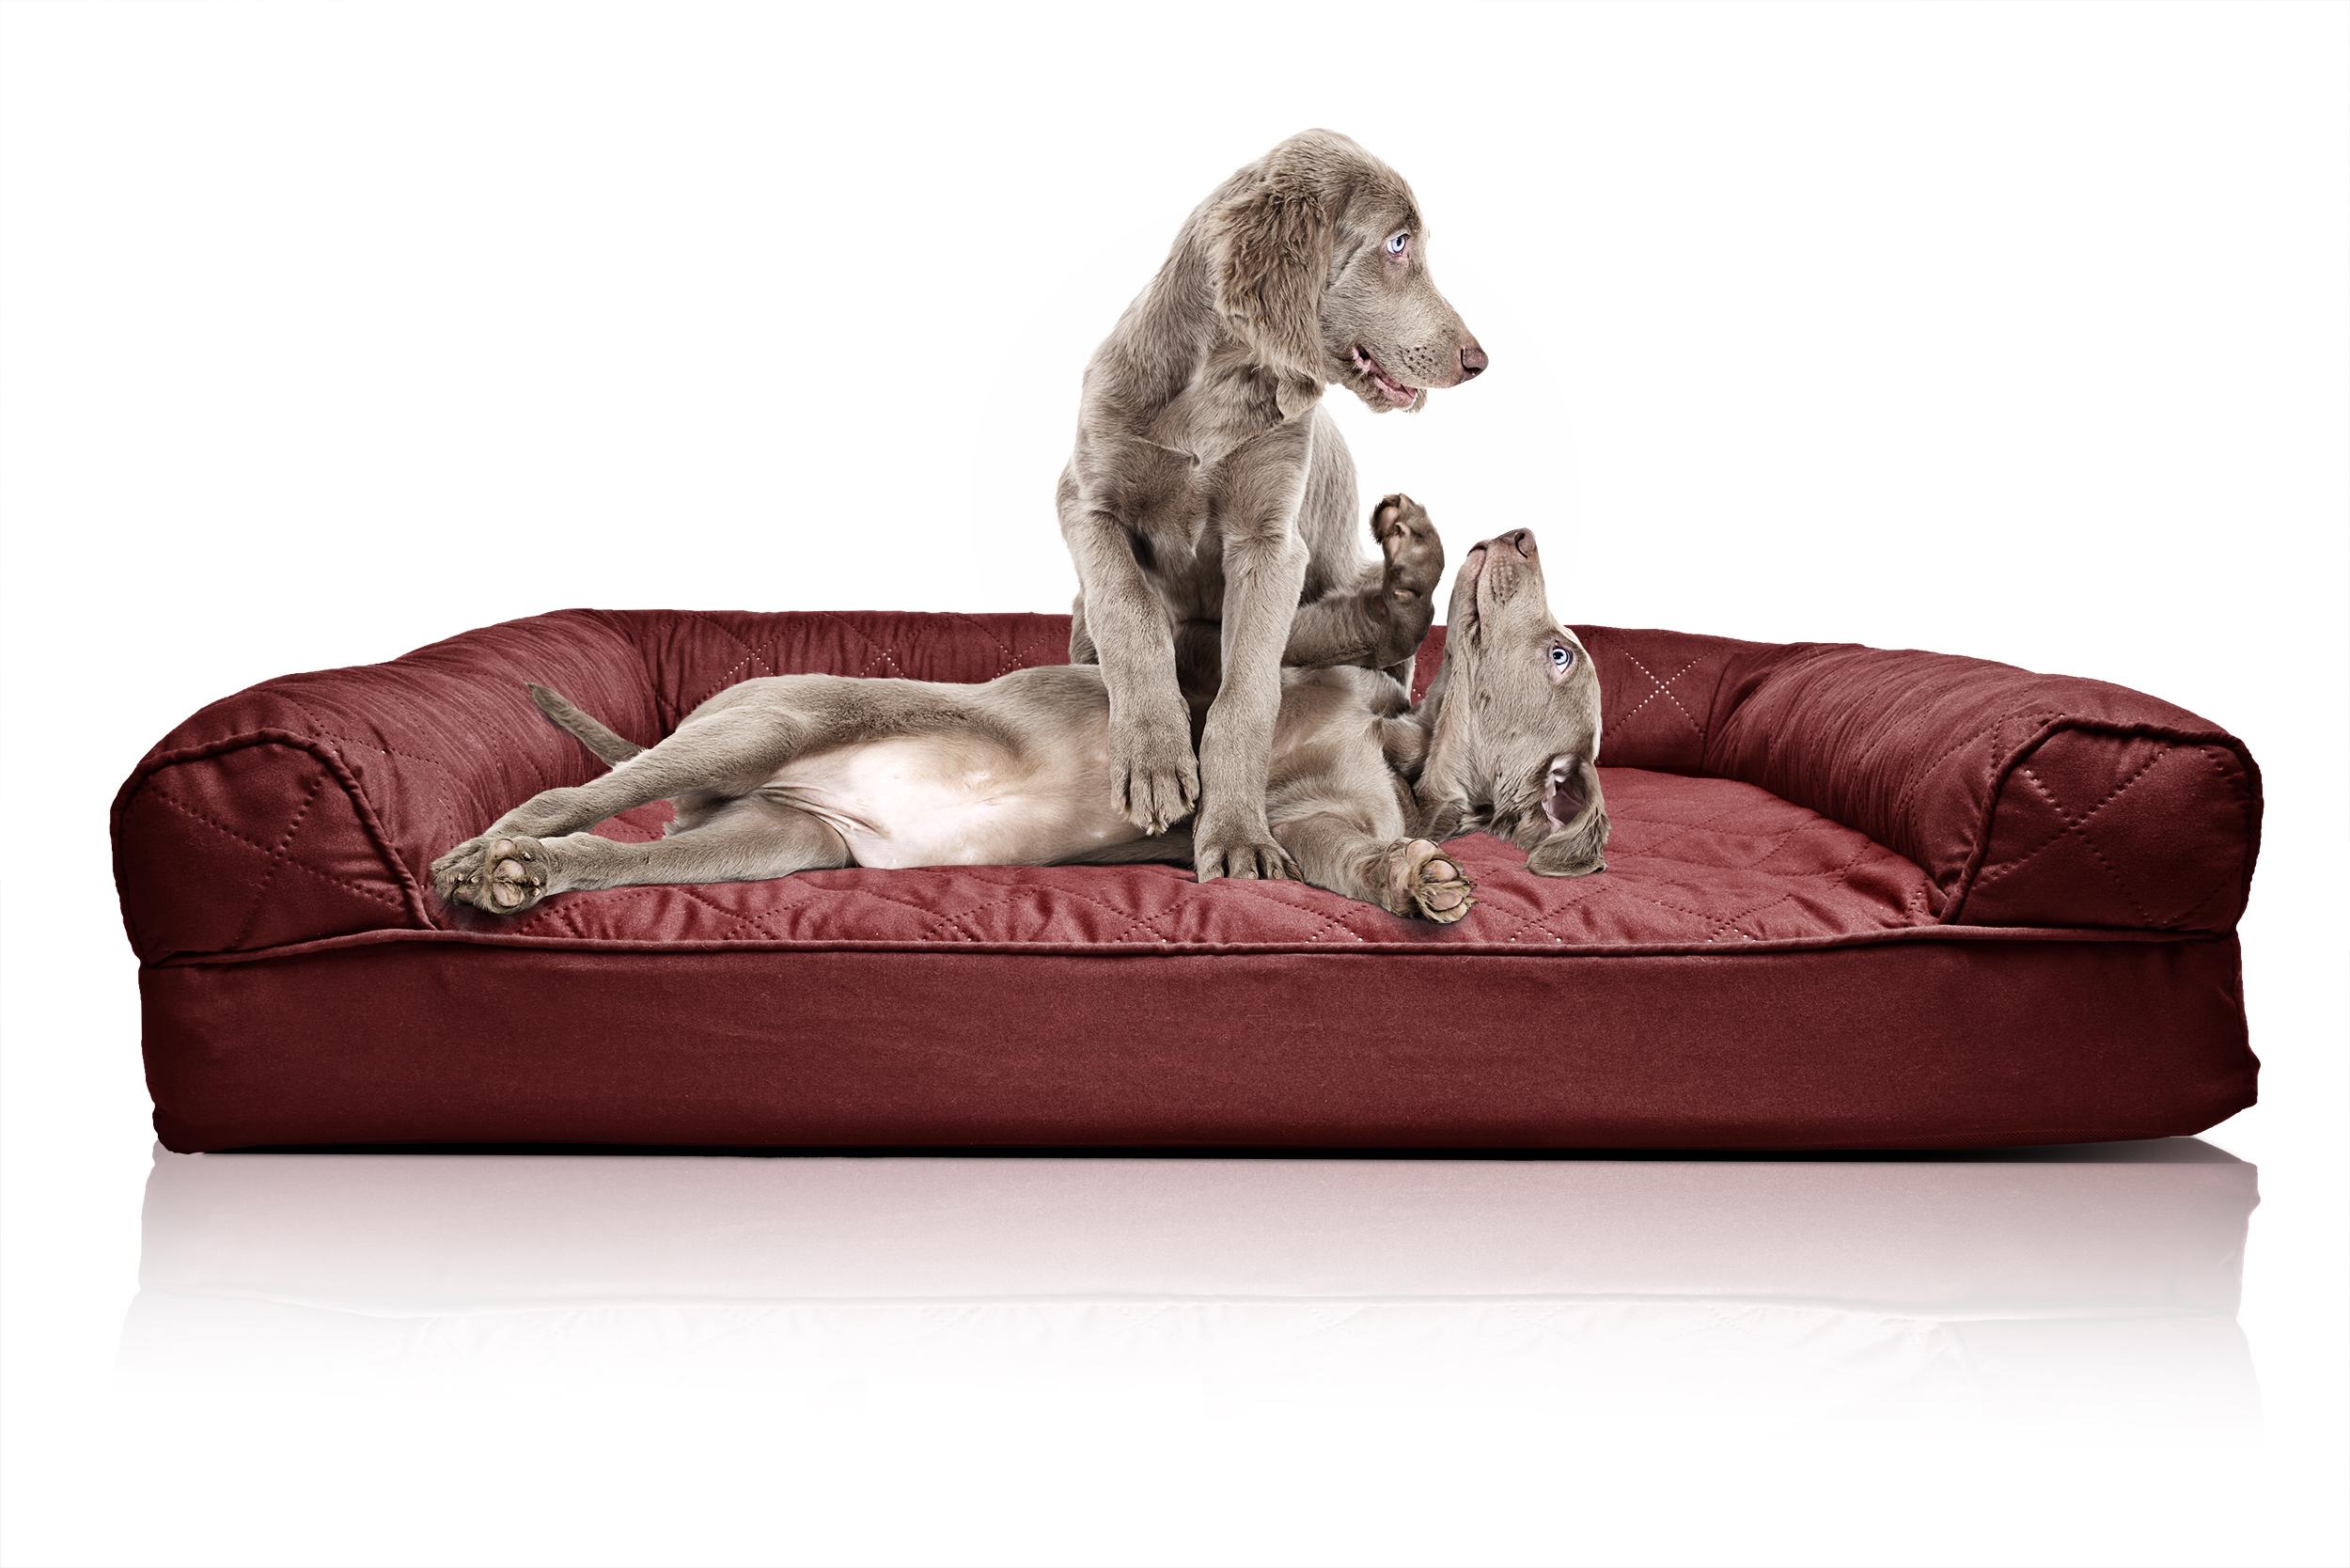 Furhaven Quilted Orthopedic Sofa Dog Bed Pet Bed Ebay